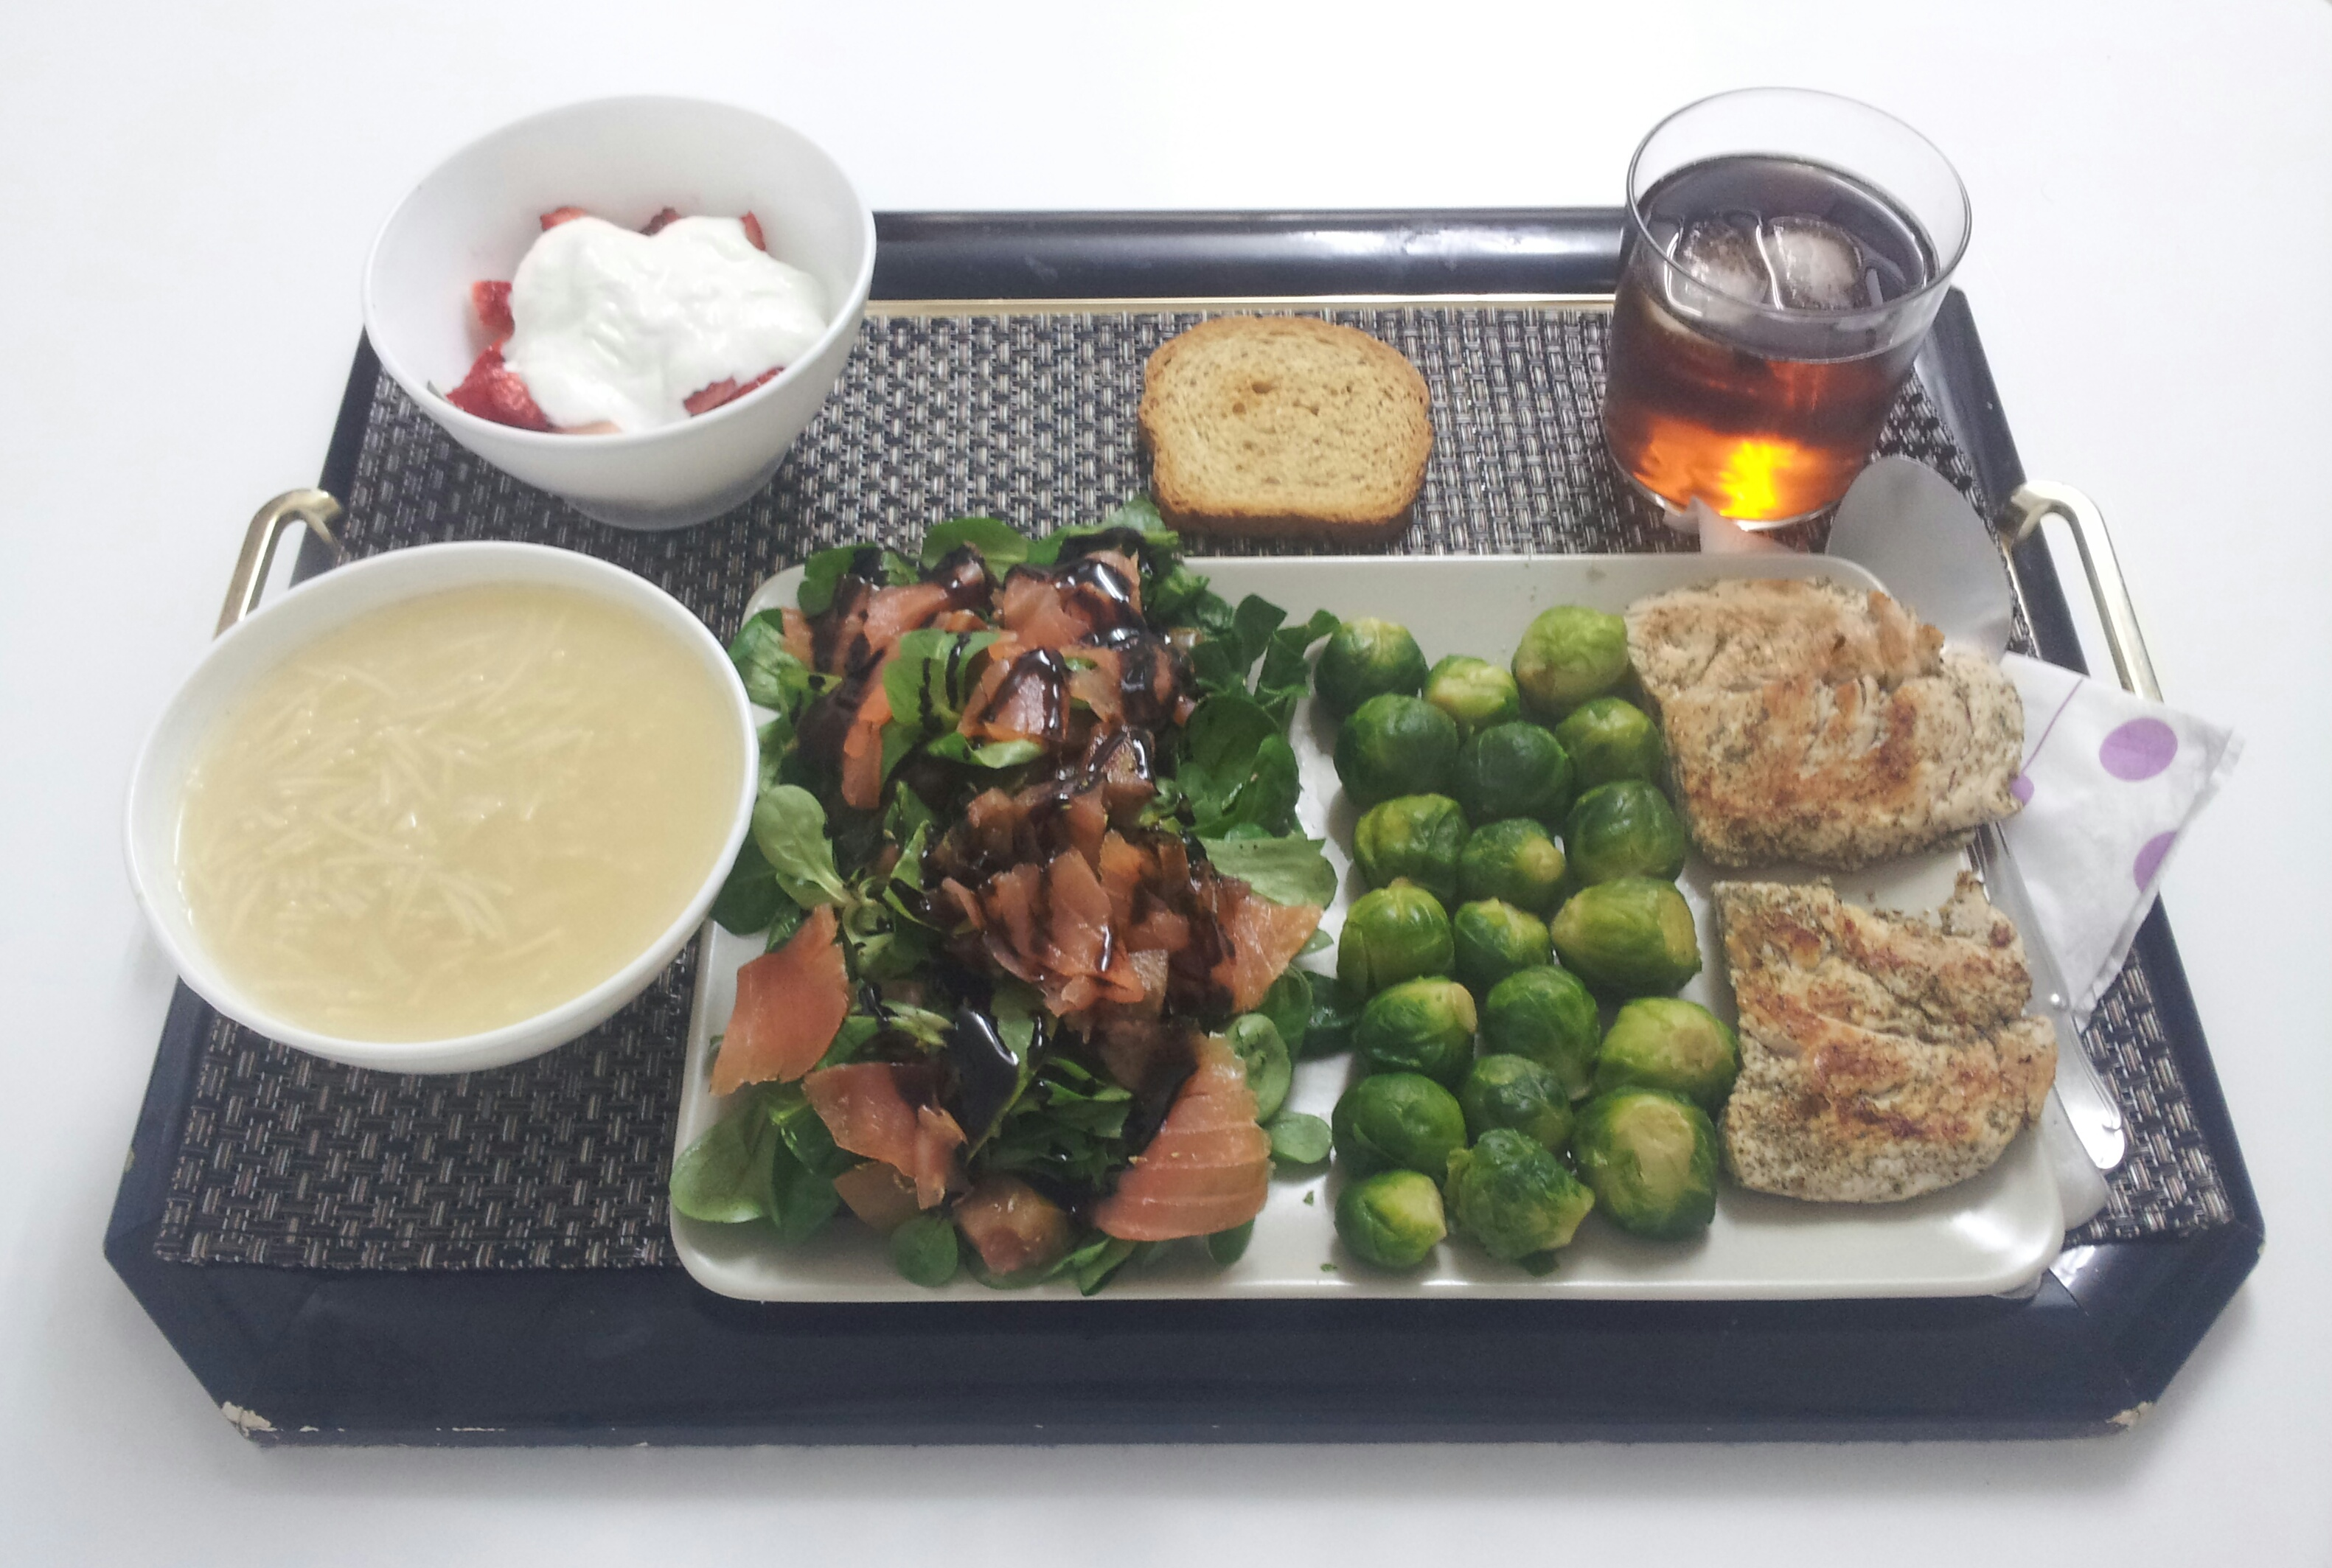 Recetas saludables, comida sana, ensalada, salmón, coles, pavo, fideos.